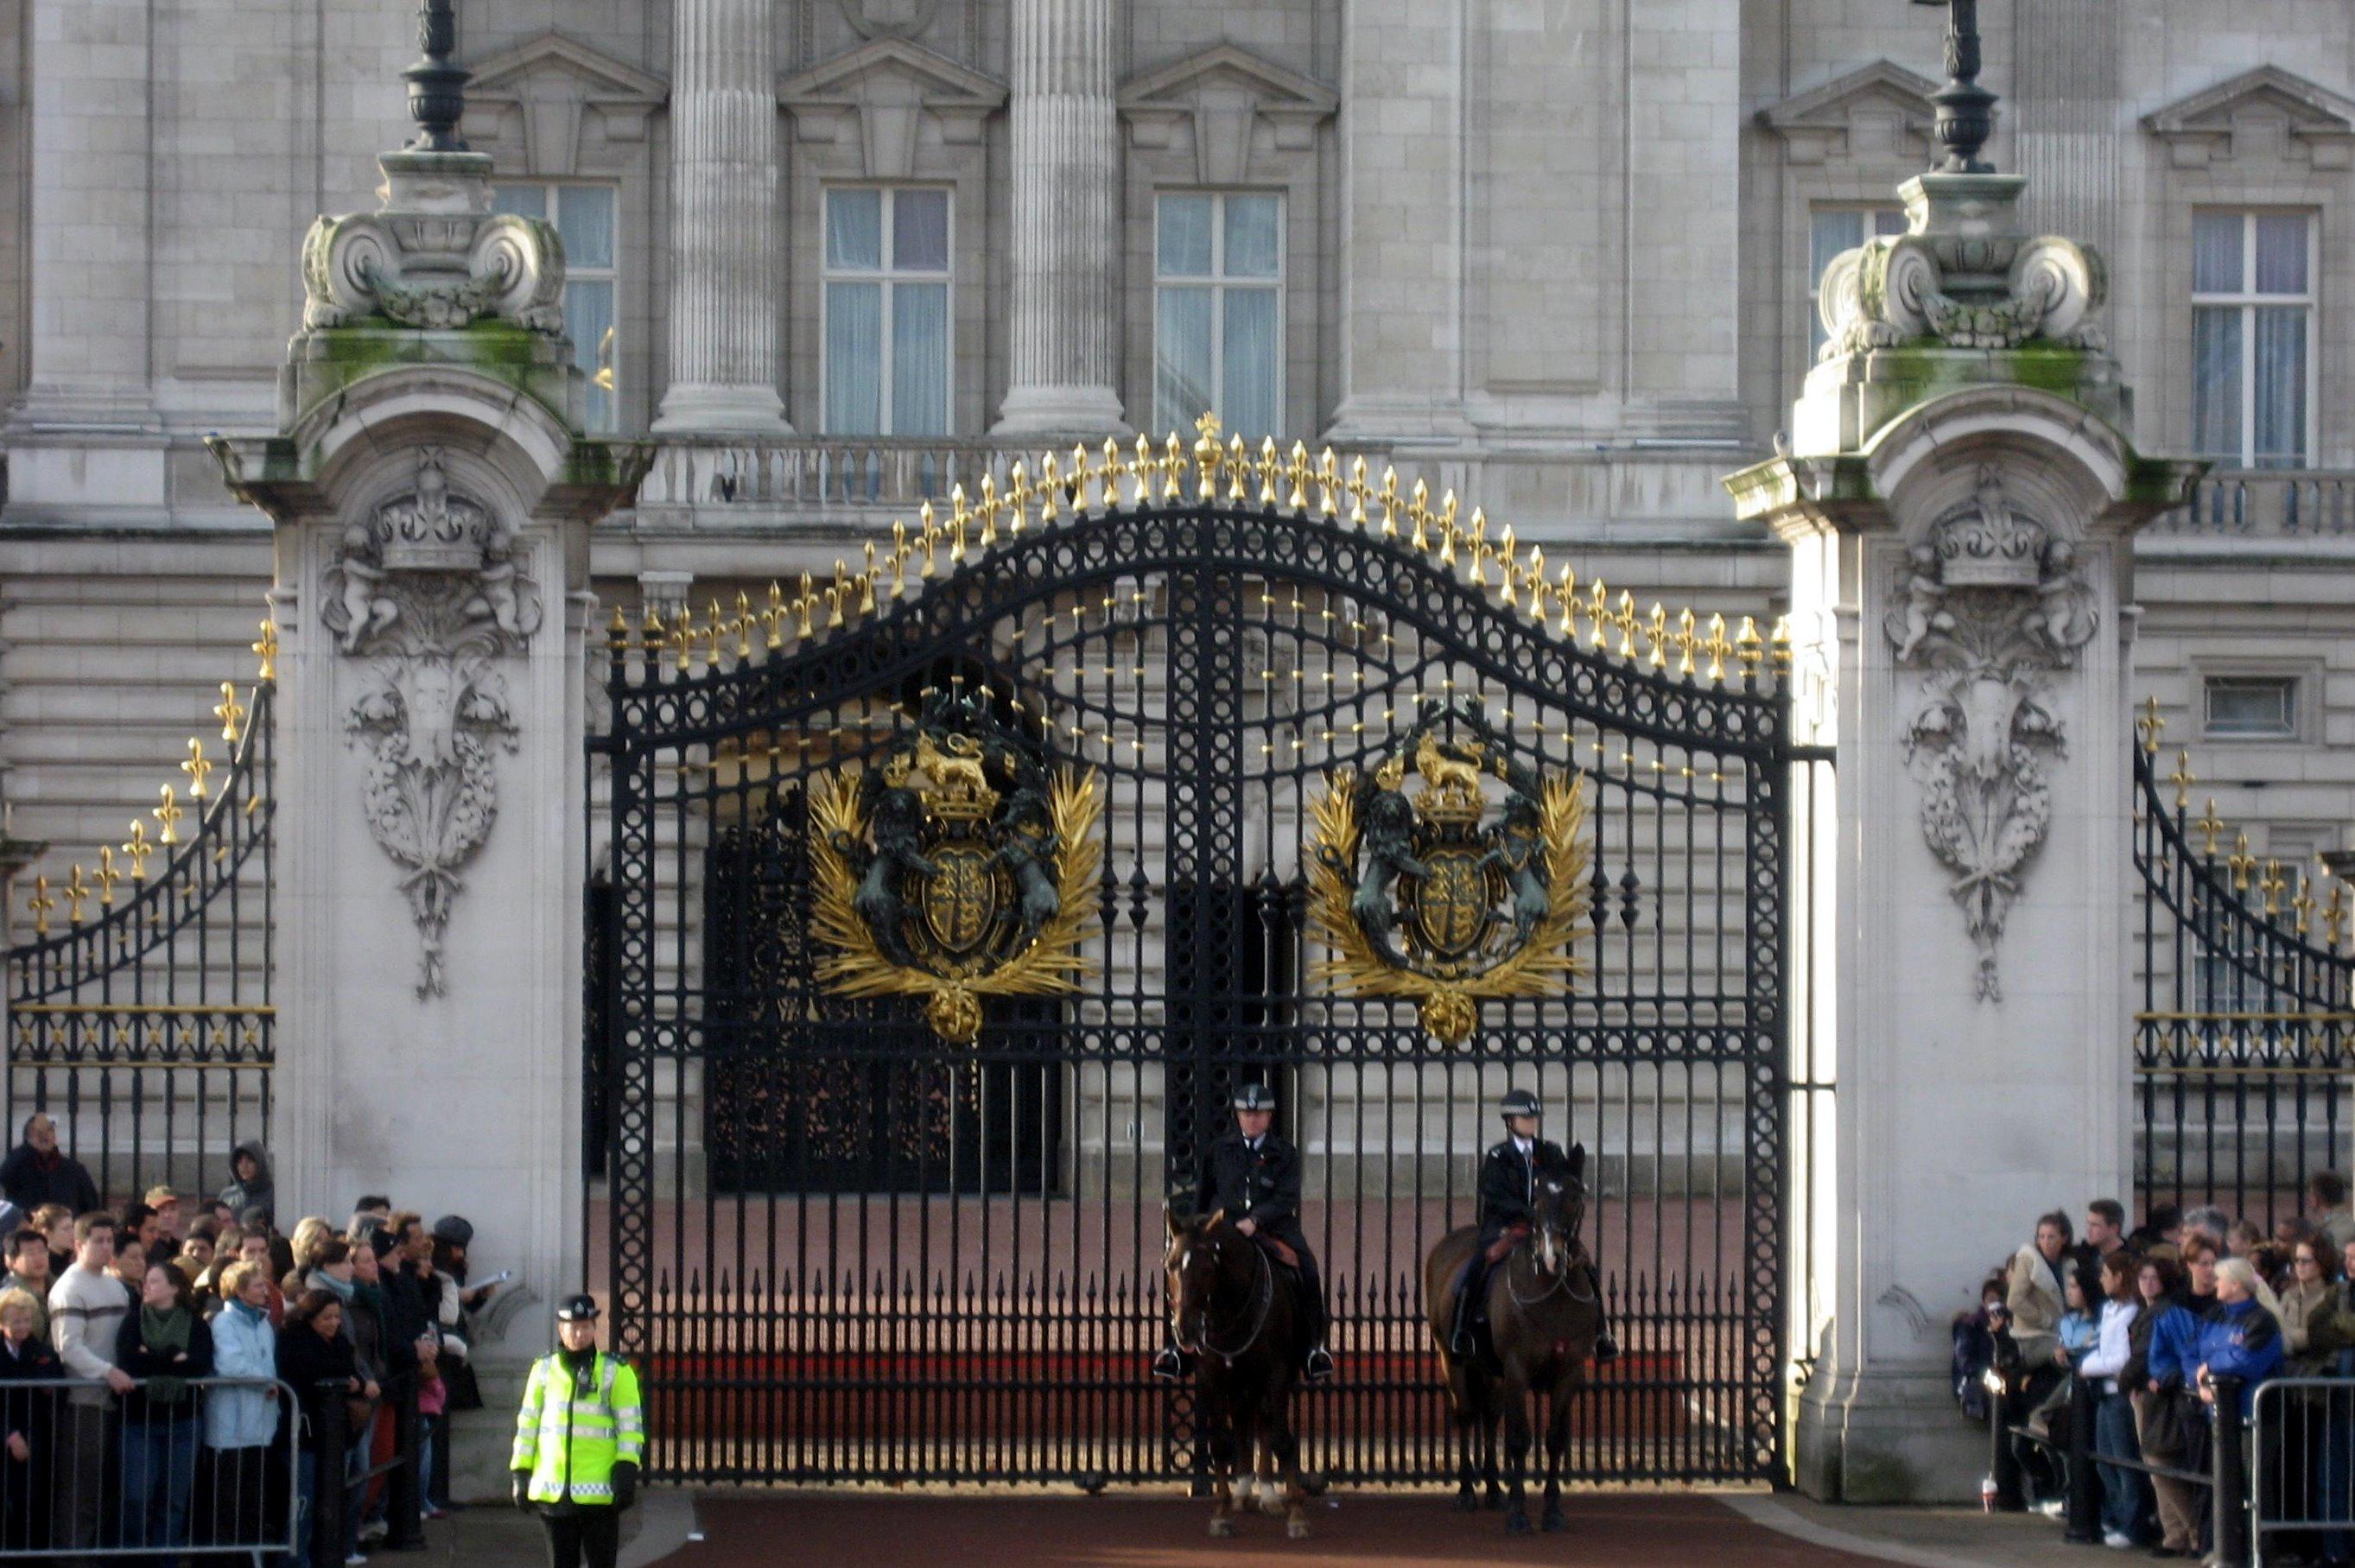 Uk london st james s buckingham palace gate flickr